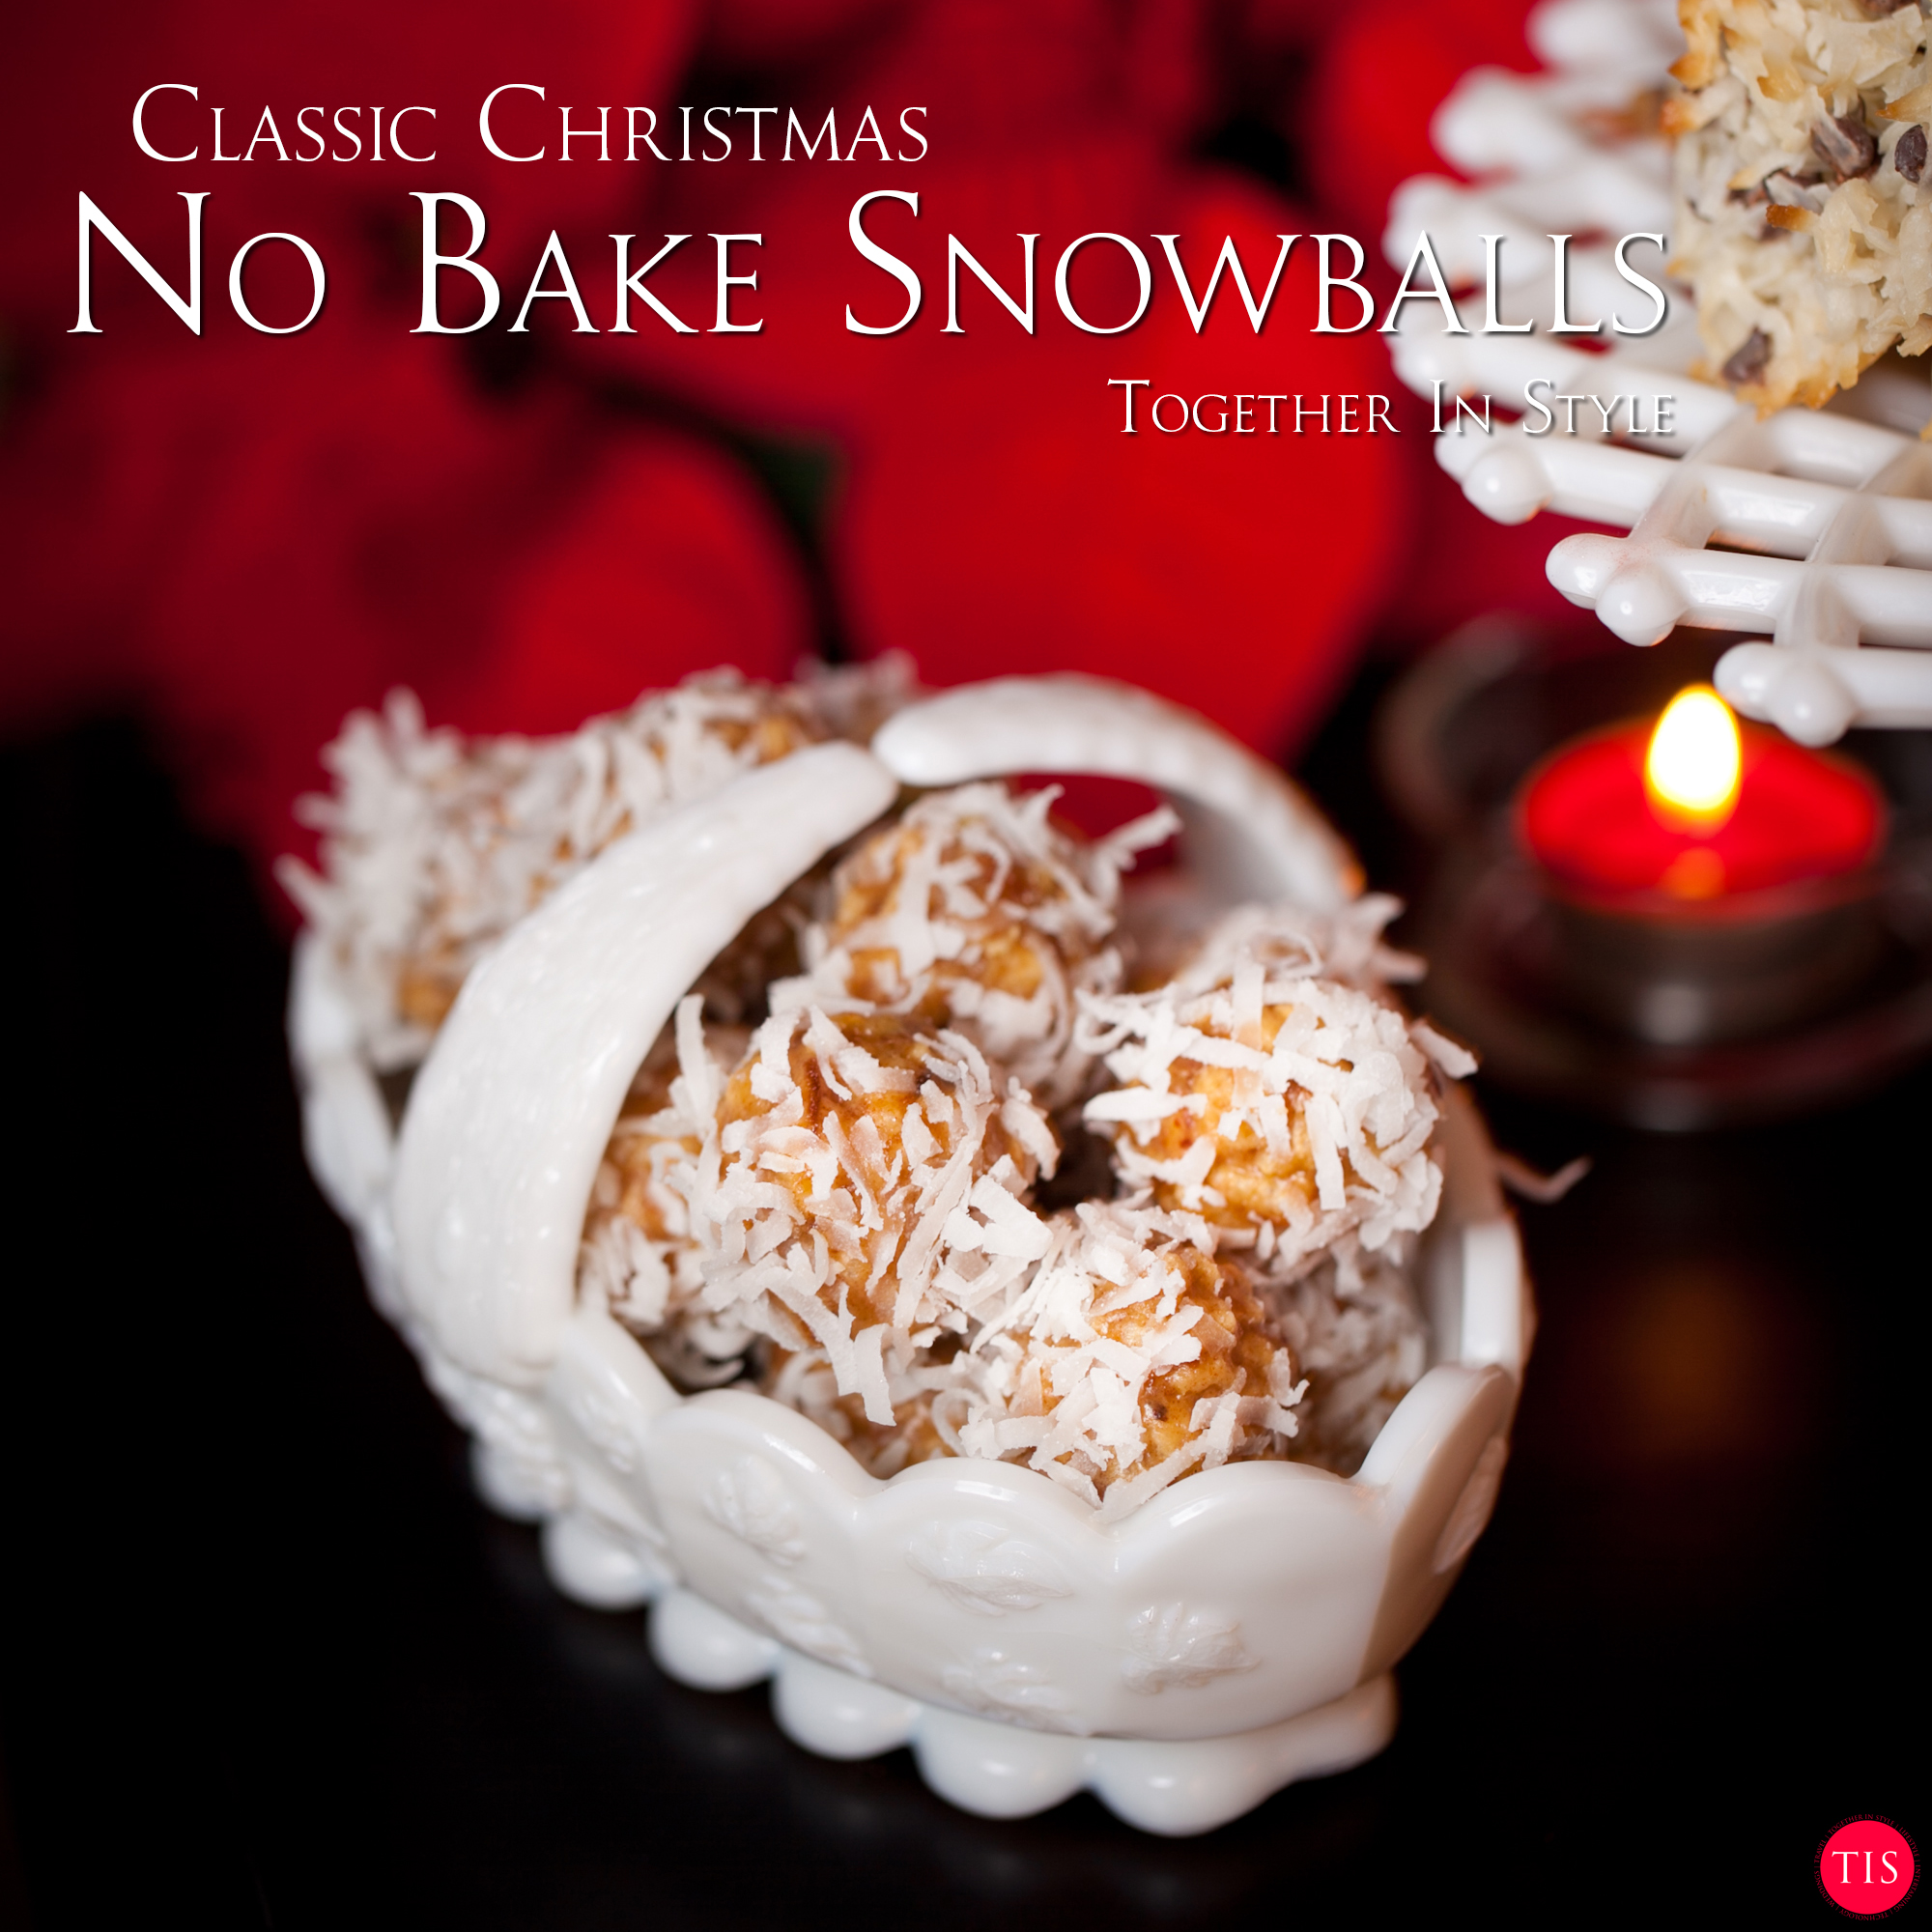 No Bake Snowball Christmas Cookies